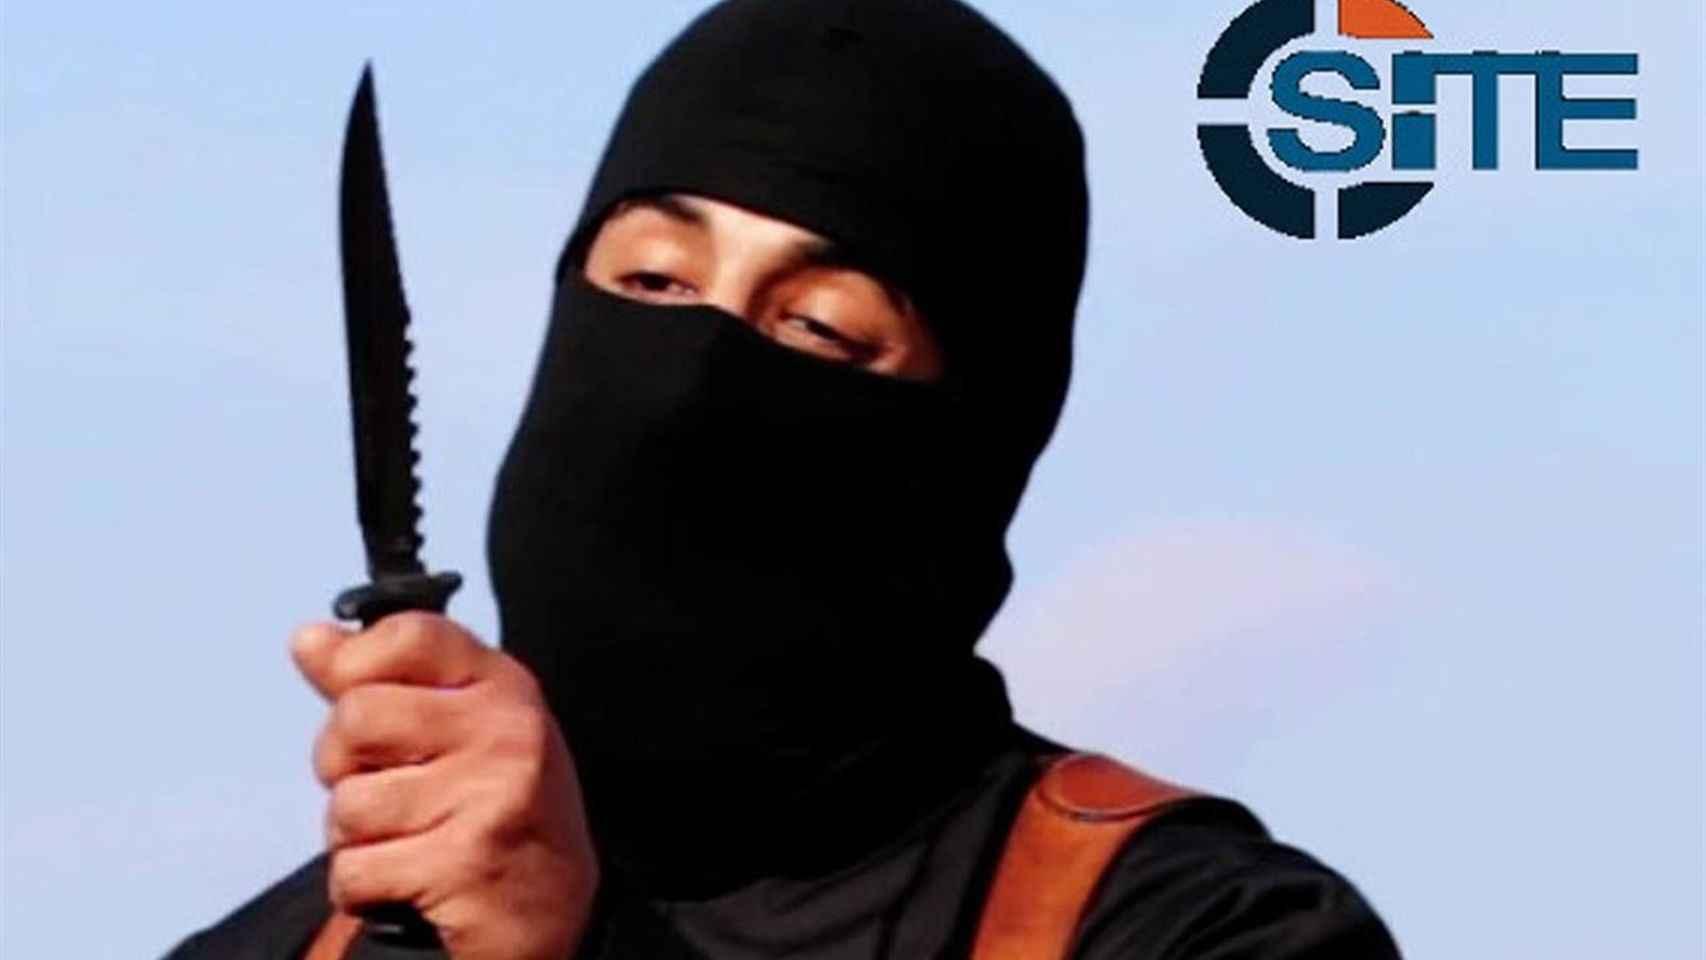 EEUU tiene una certeza razonable de la muerte del 'Yihadista John'